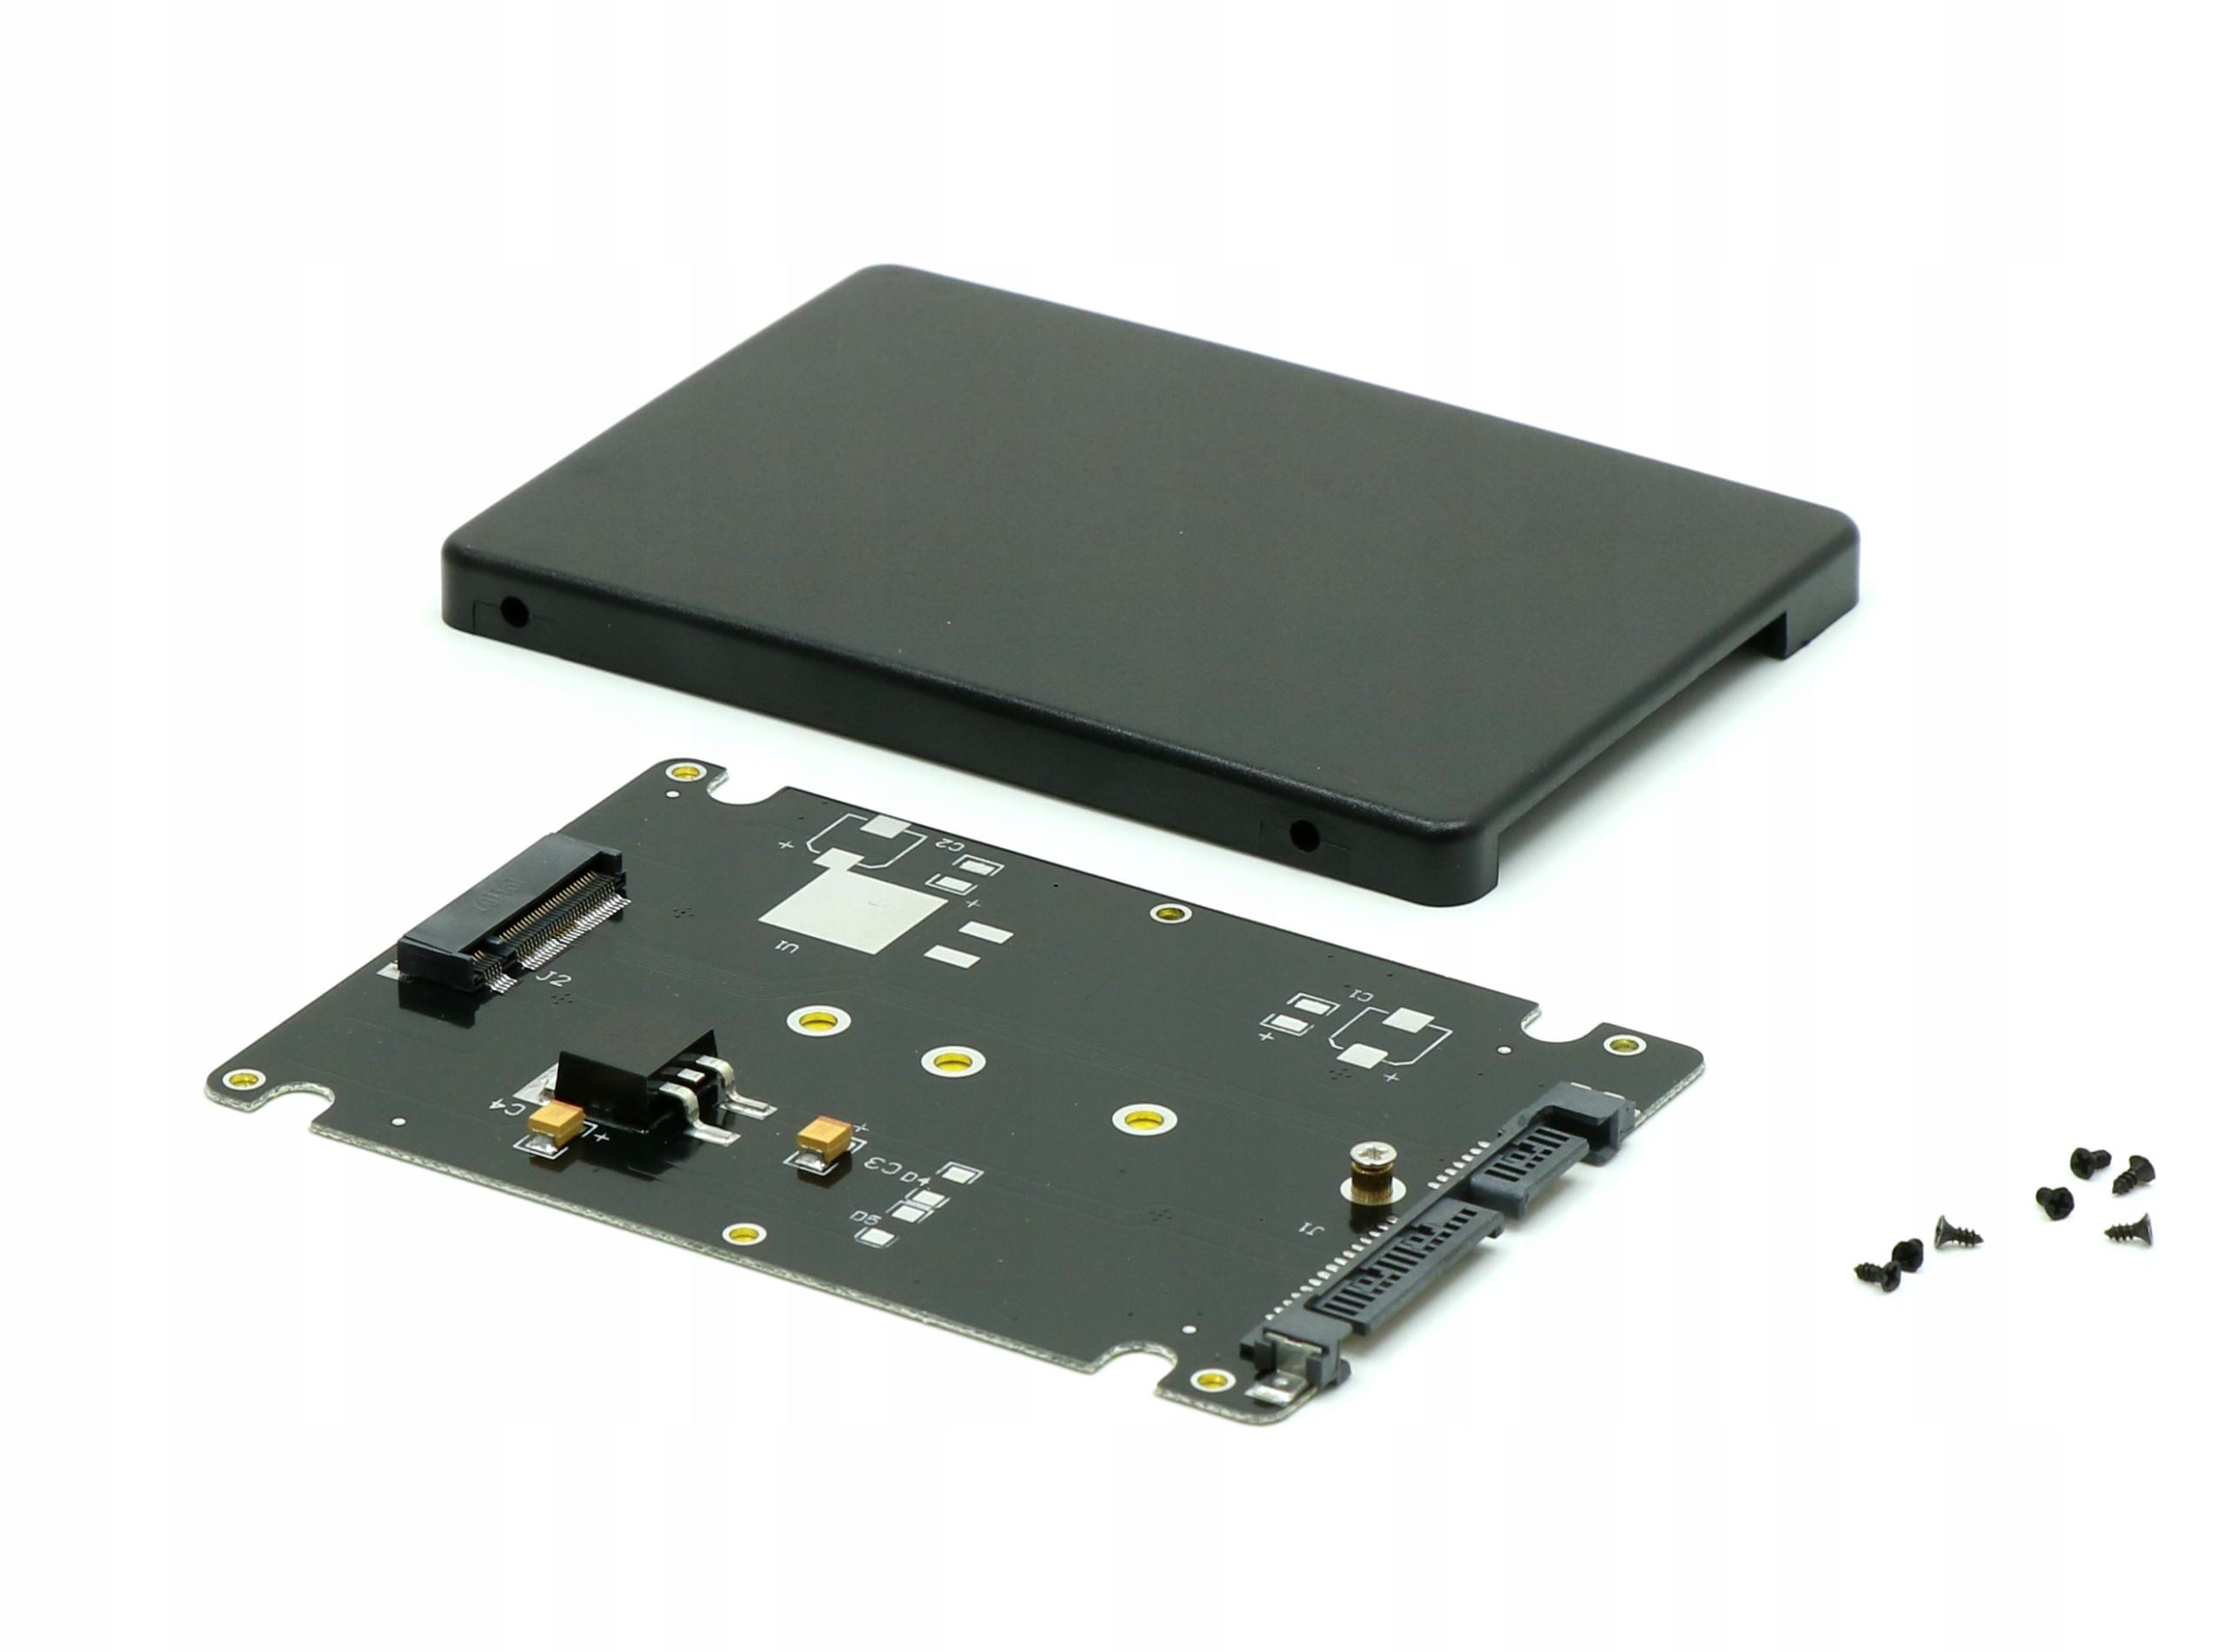 Корпус диска для адаптера диска SATA3 M.2 NGFF SSD